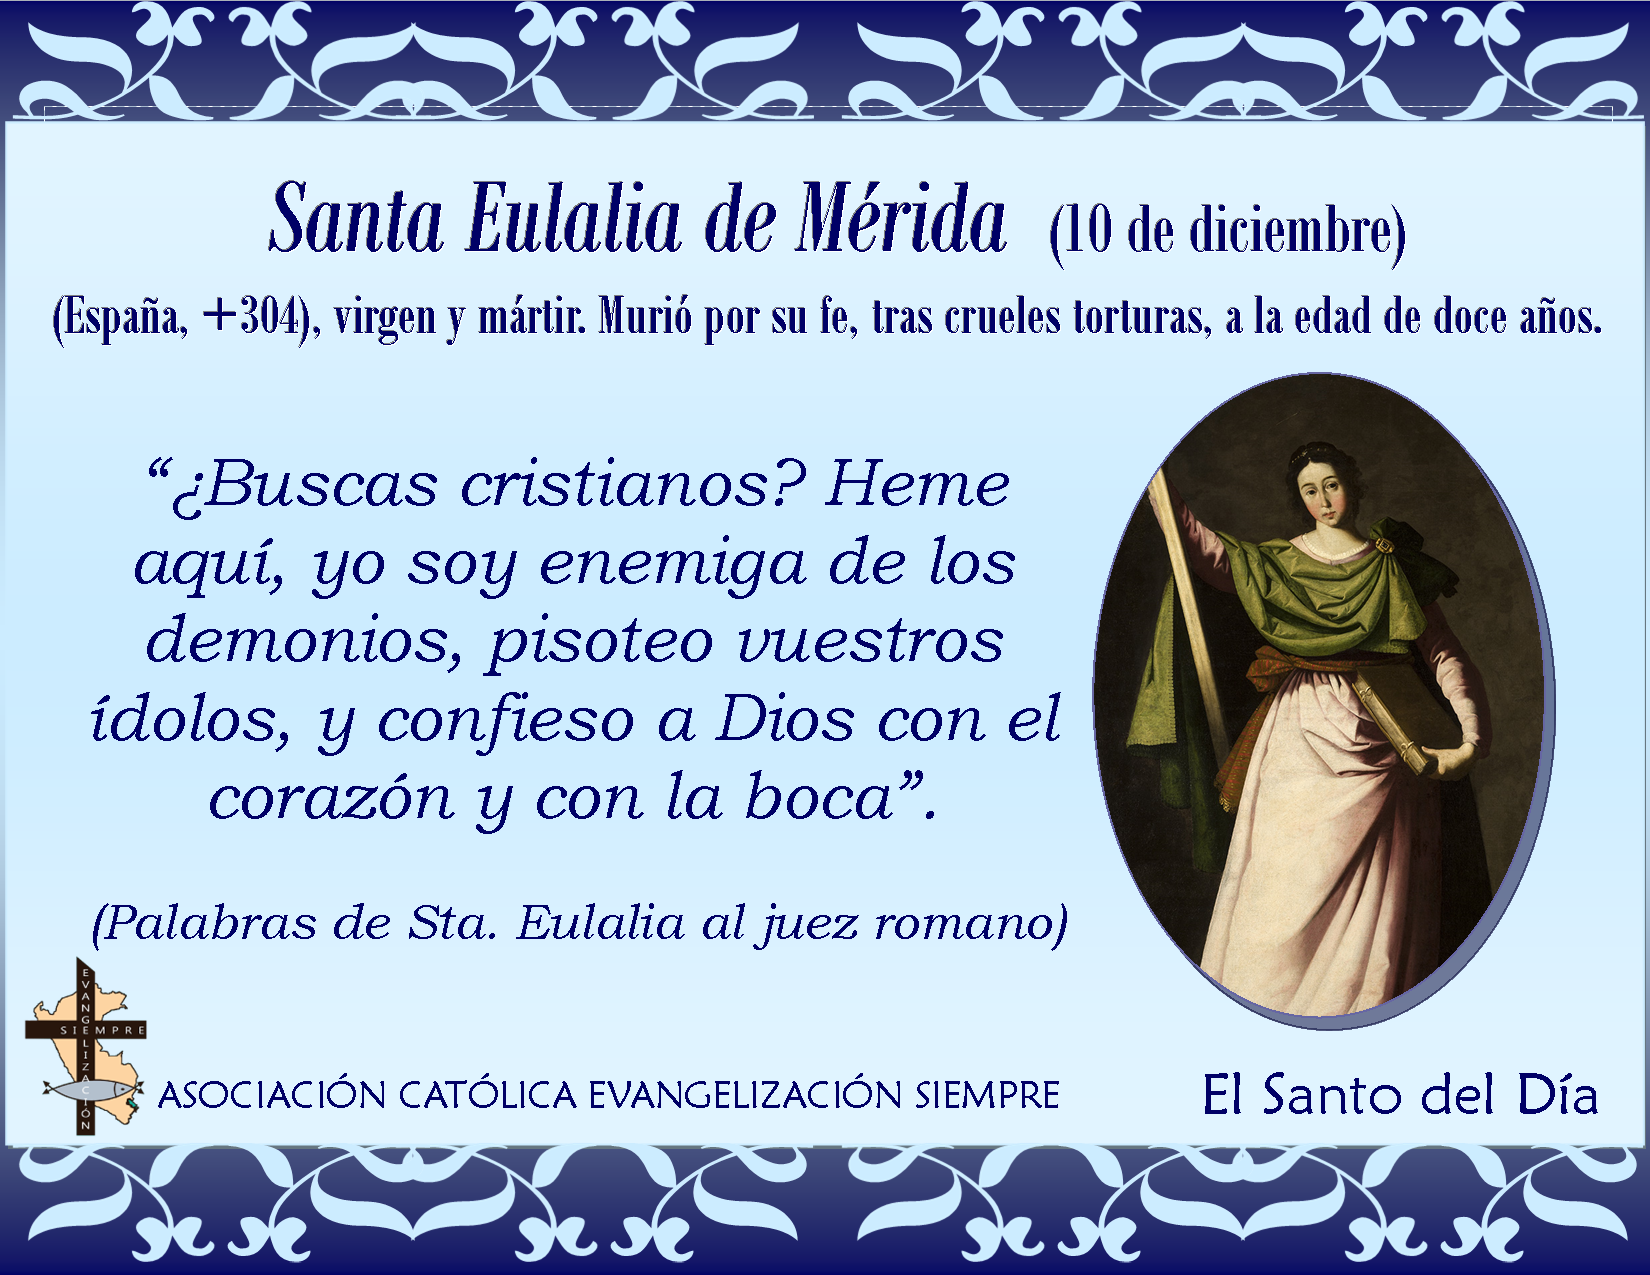 santo-del-dia-10-diciembre